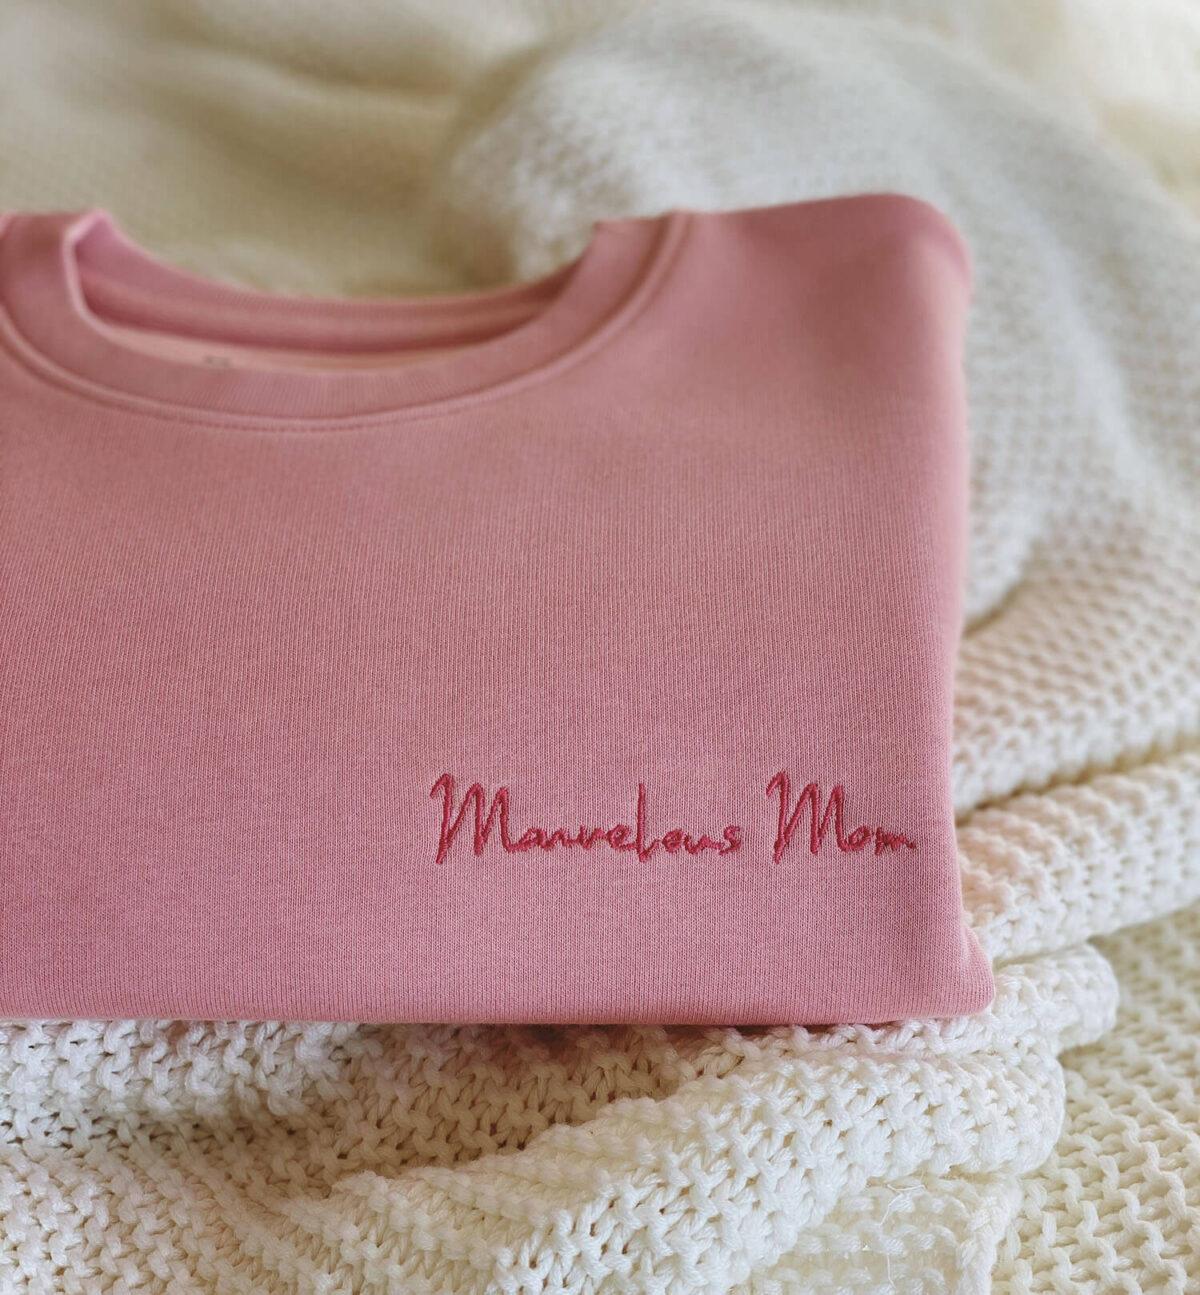 Marvelous Mom sweater by Mangos on Monday-Mom-MonM-LeenDictus3